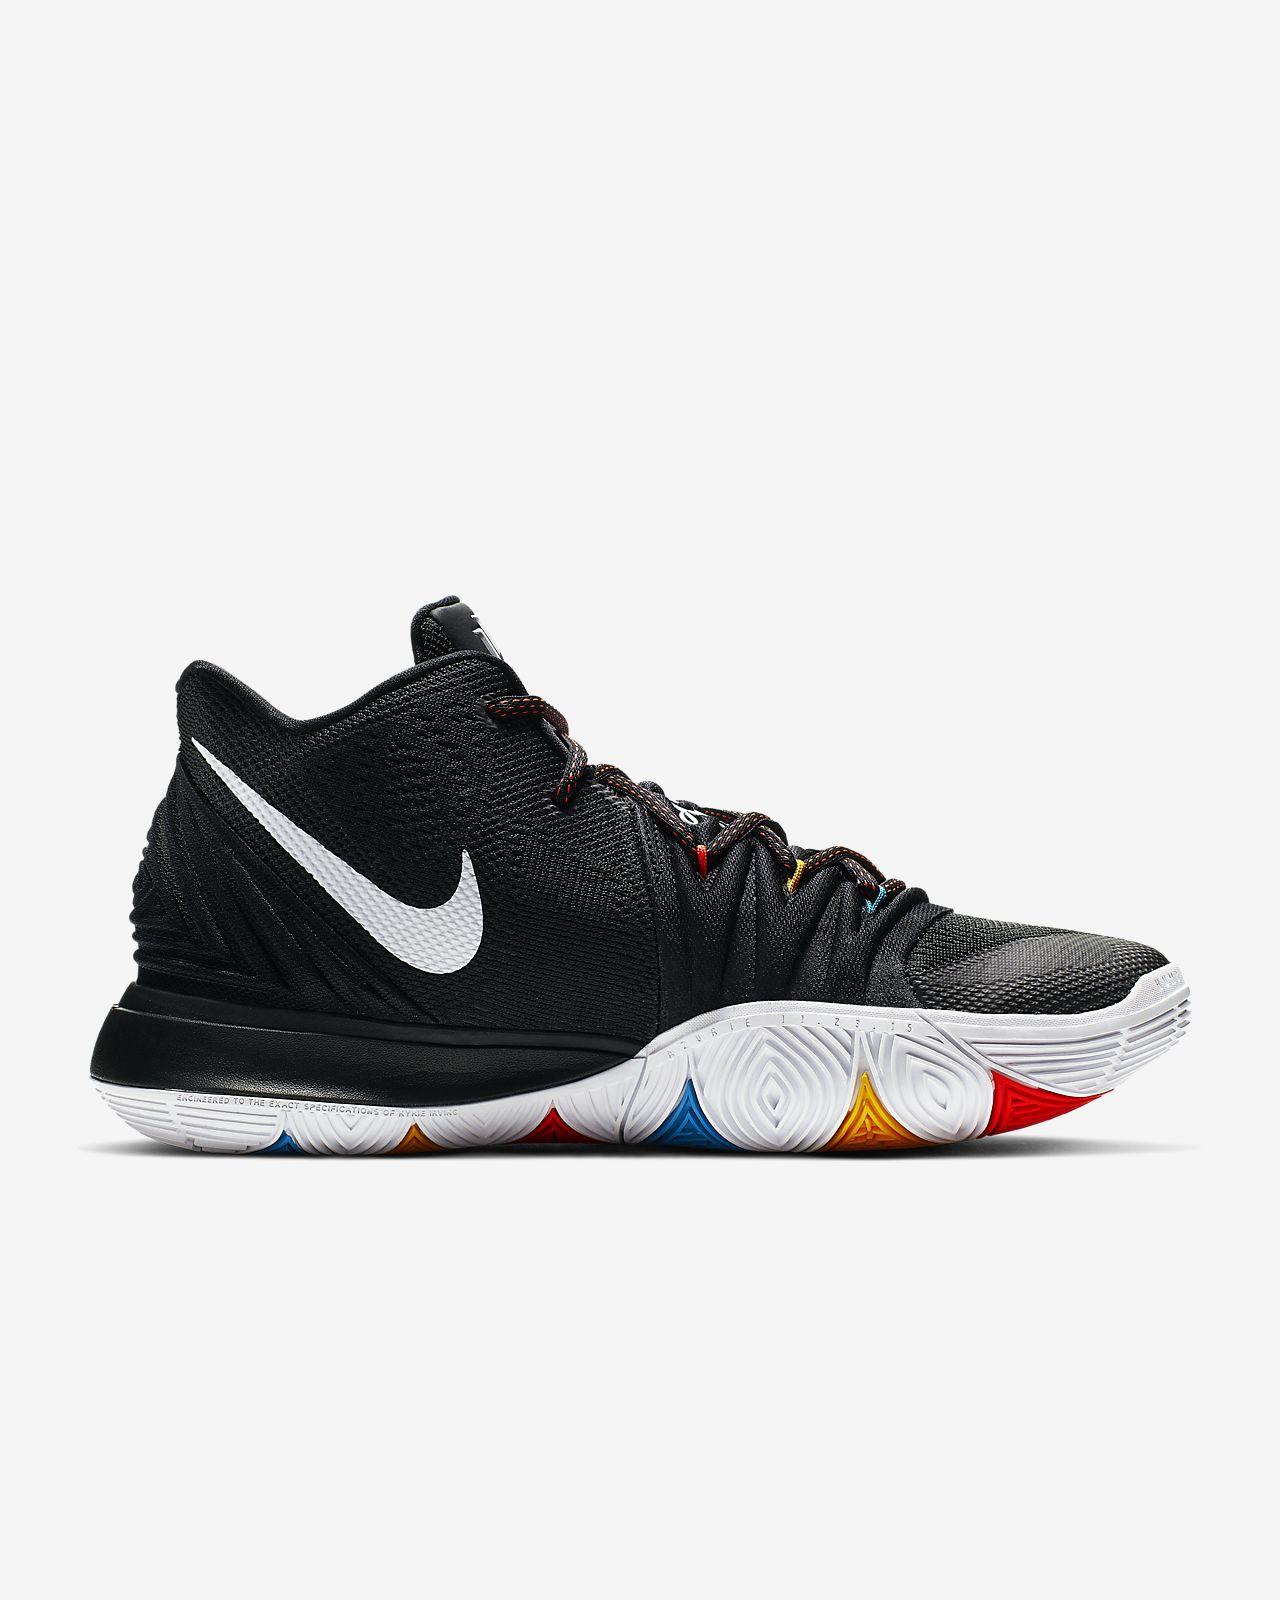 the best attitude 06ff1 15f14 Kyrie 5 x Friends Basketball Shoe. Nike.com CA